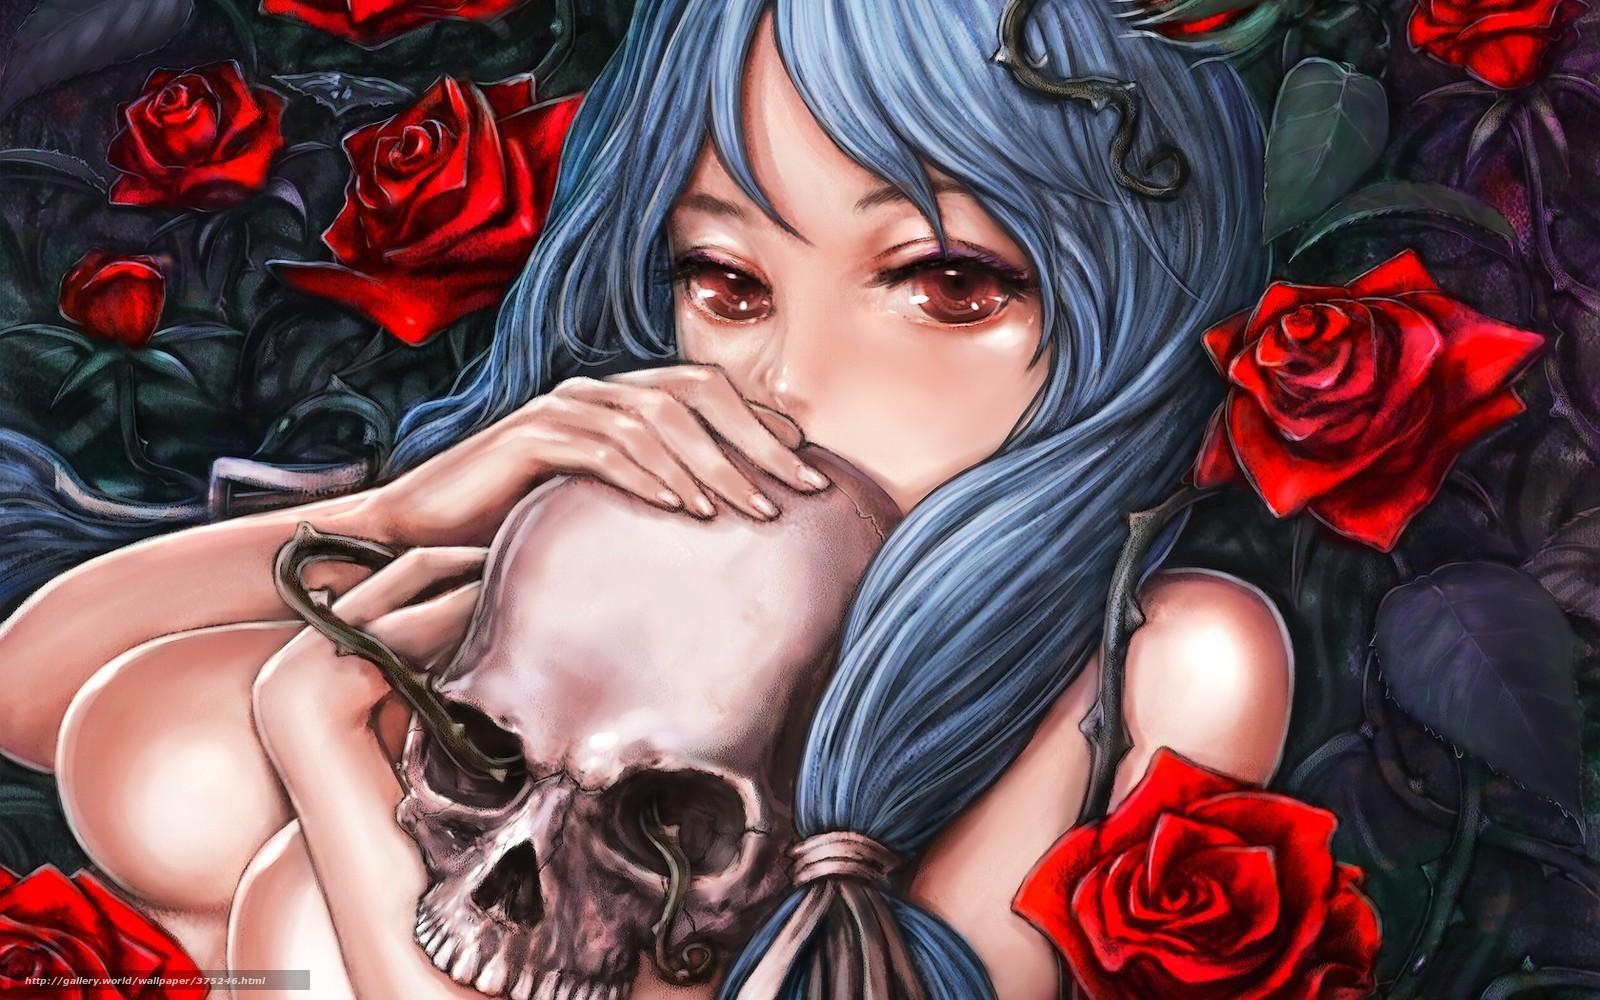 Skull and girls nude wallpapers xxx scenes